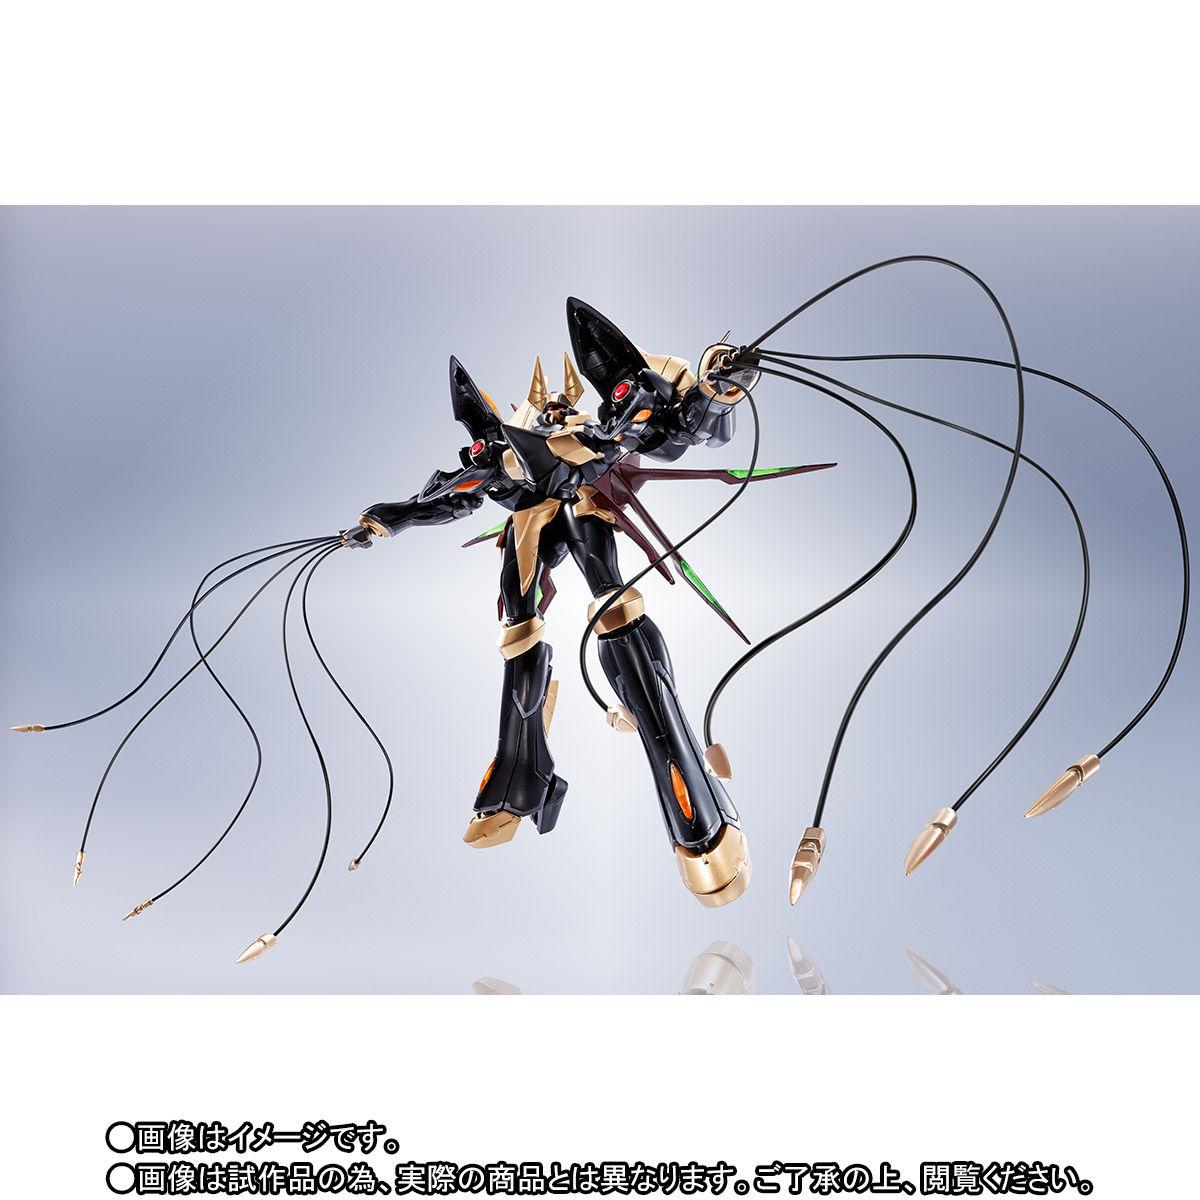 ROBOT魂〈SIDE KMF〉『ガウェイン ~BLACK REBELLION~』コードギアス 可動フィギュア-009